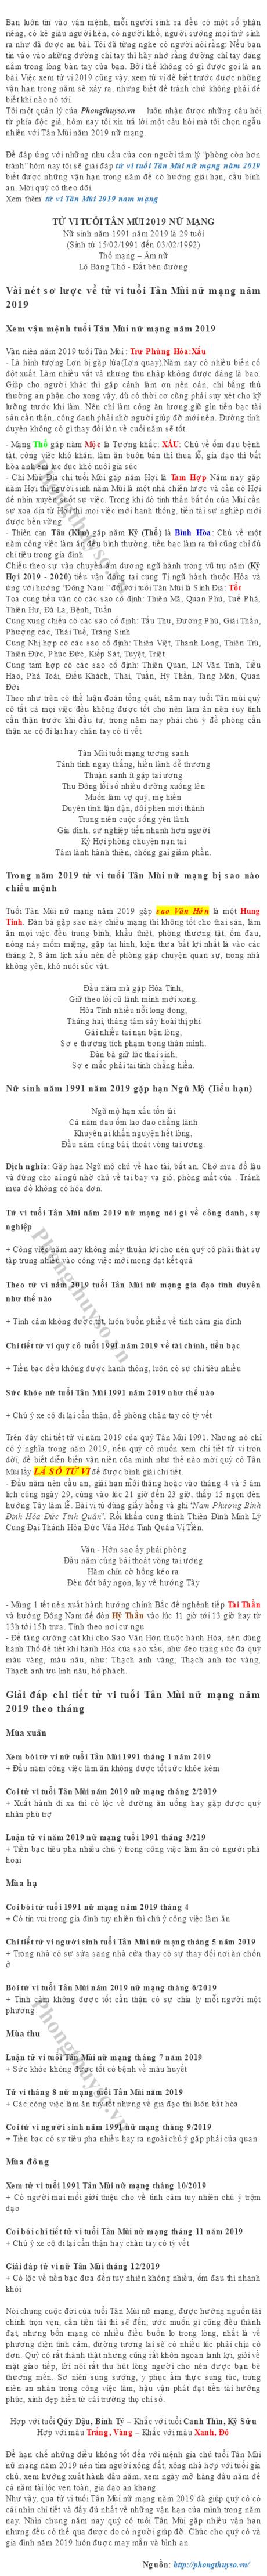 tu-vi-tuoi-tan-mui-nam-2019-nu-mang